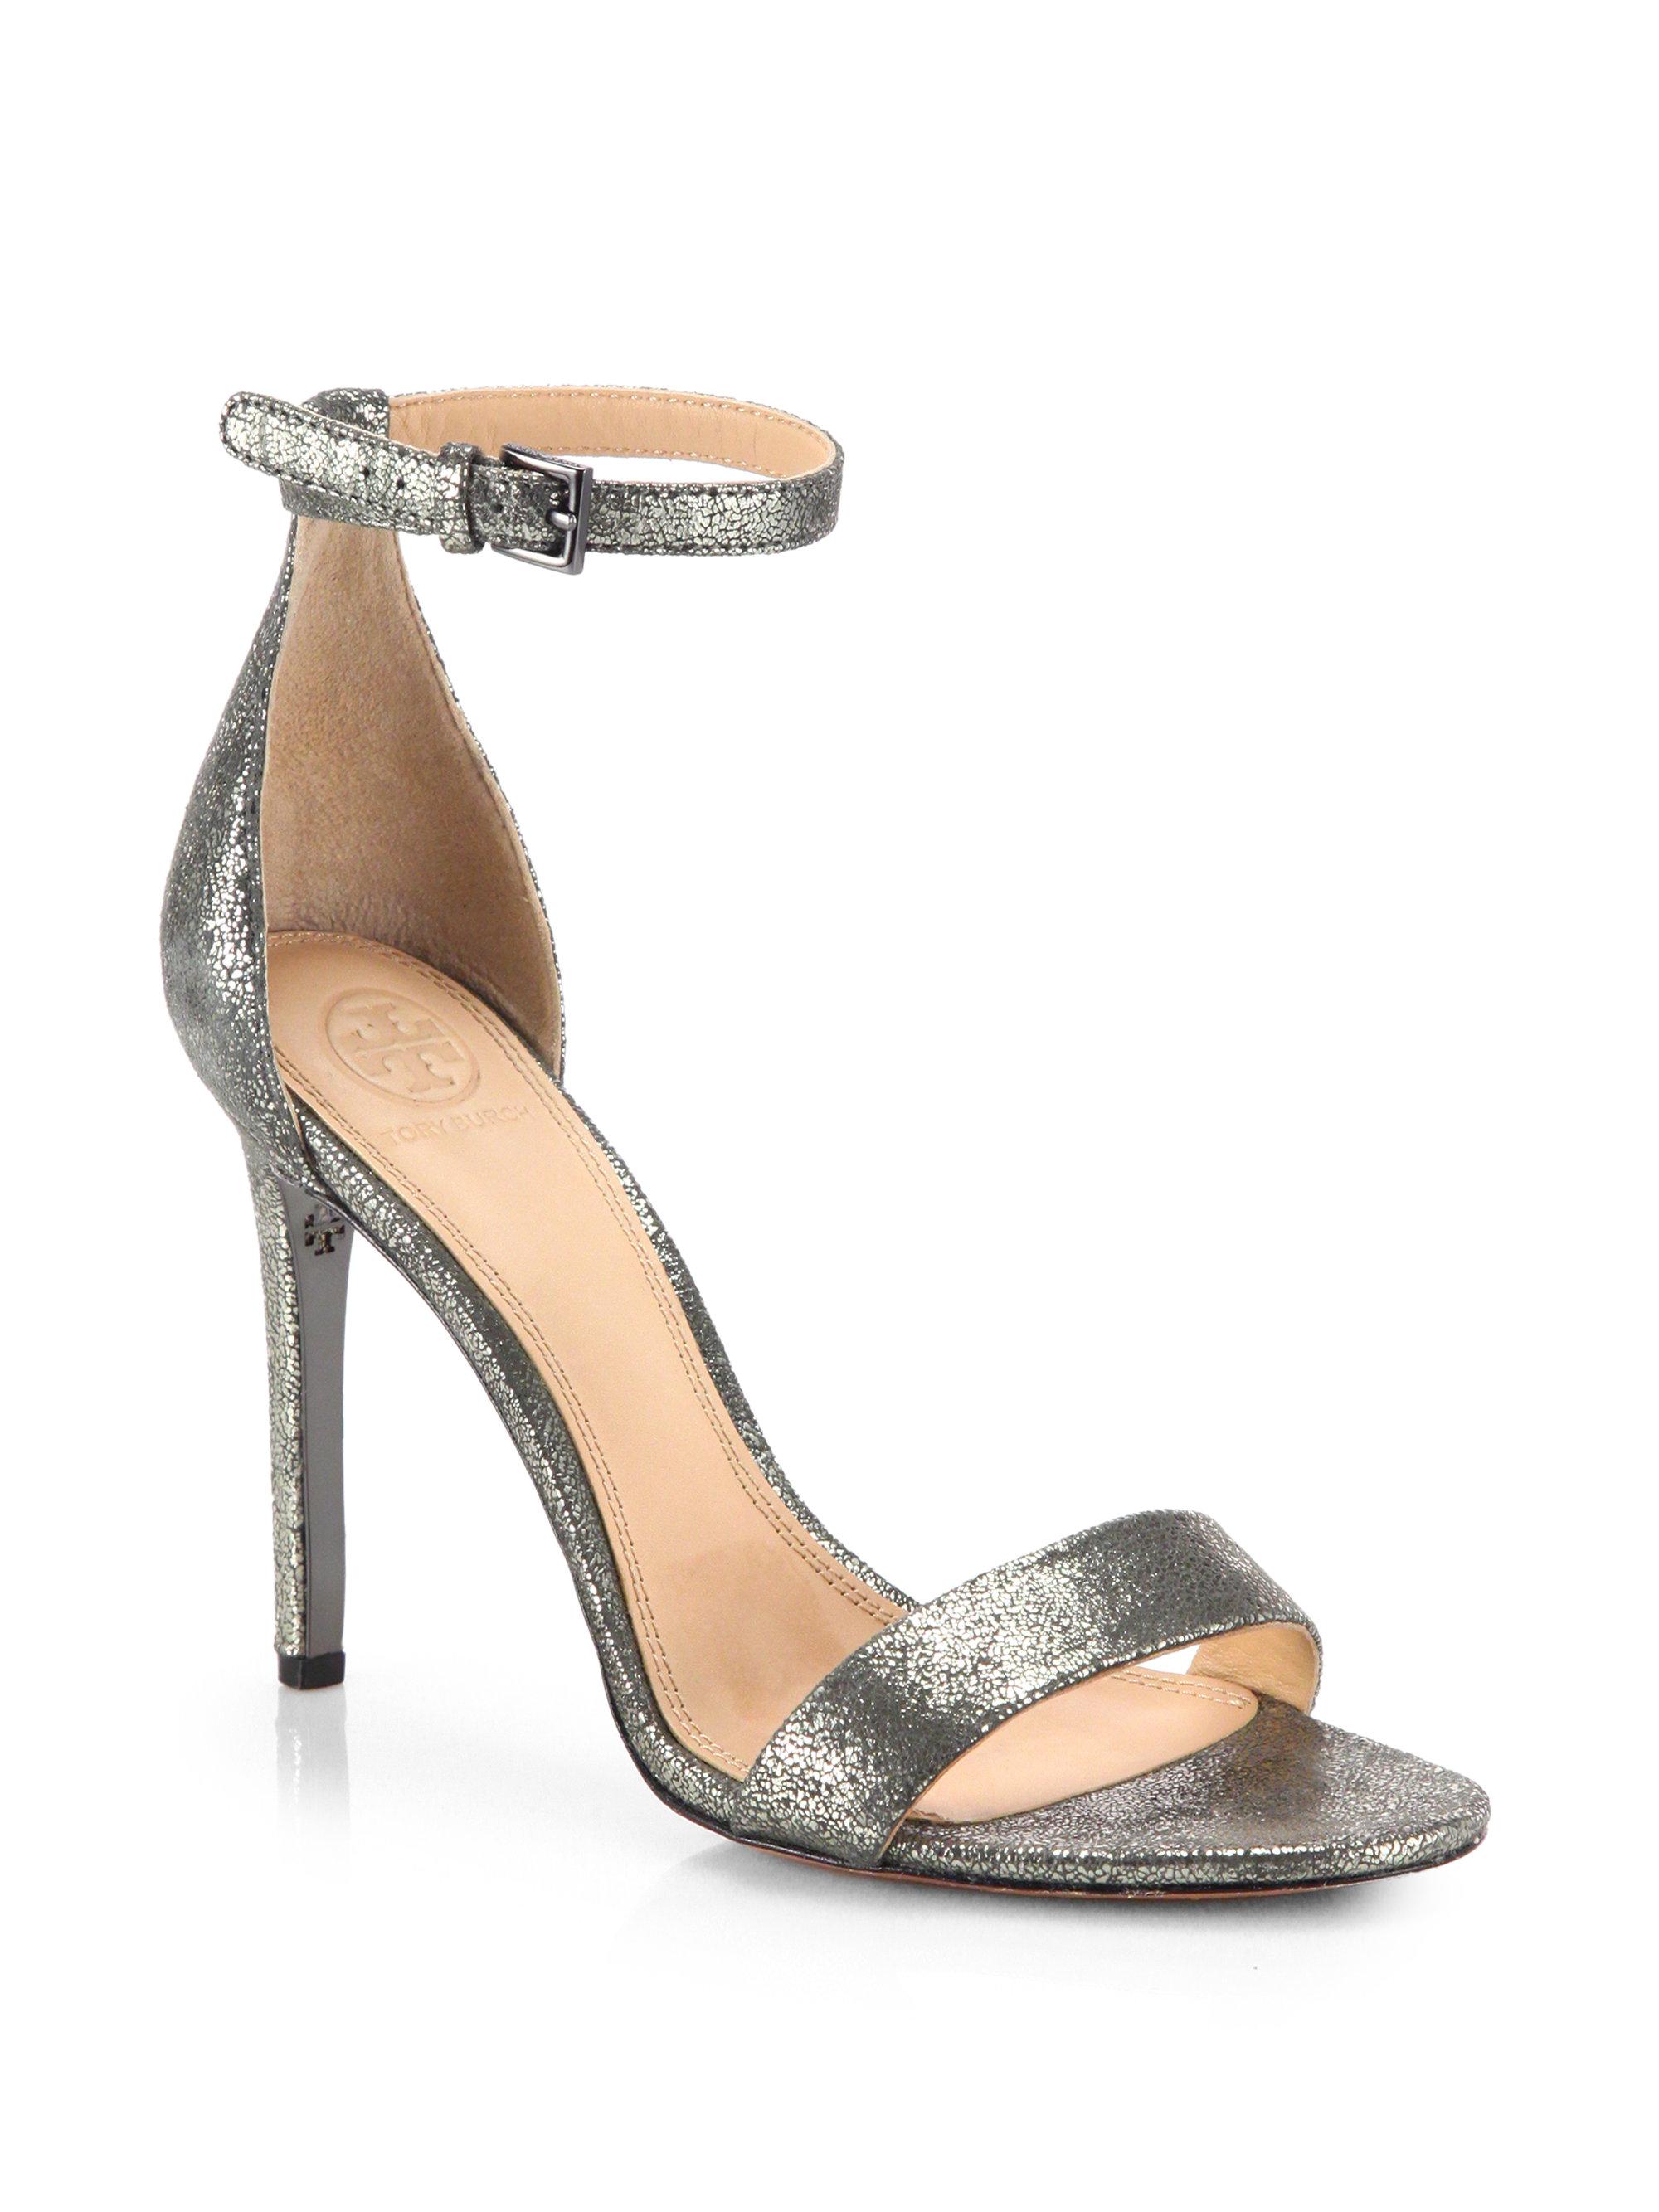 6aee93cecacc Lyst - Tory Burch Keri Crackled Metallic Leather Sandals in Metallic